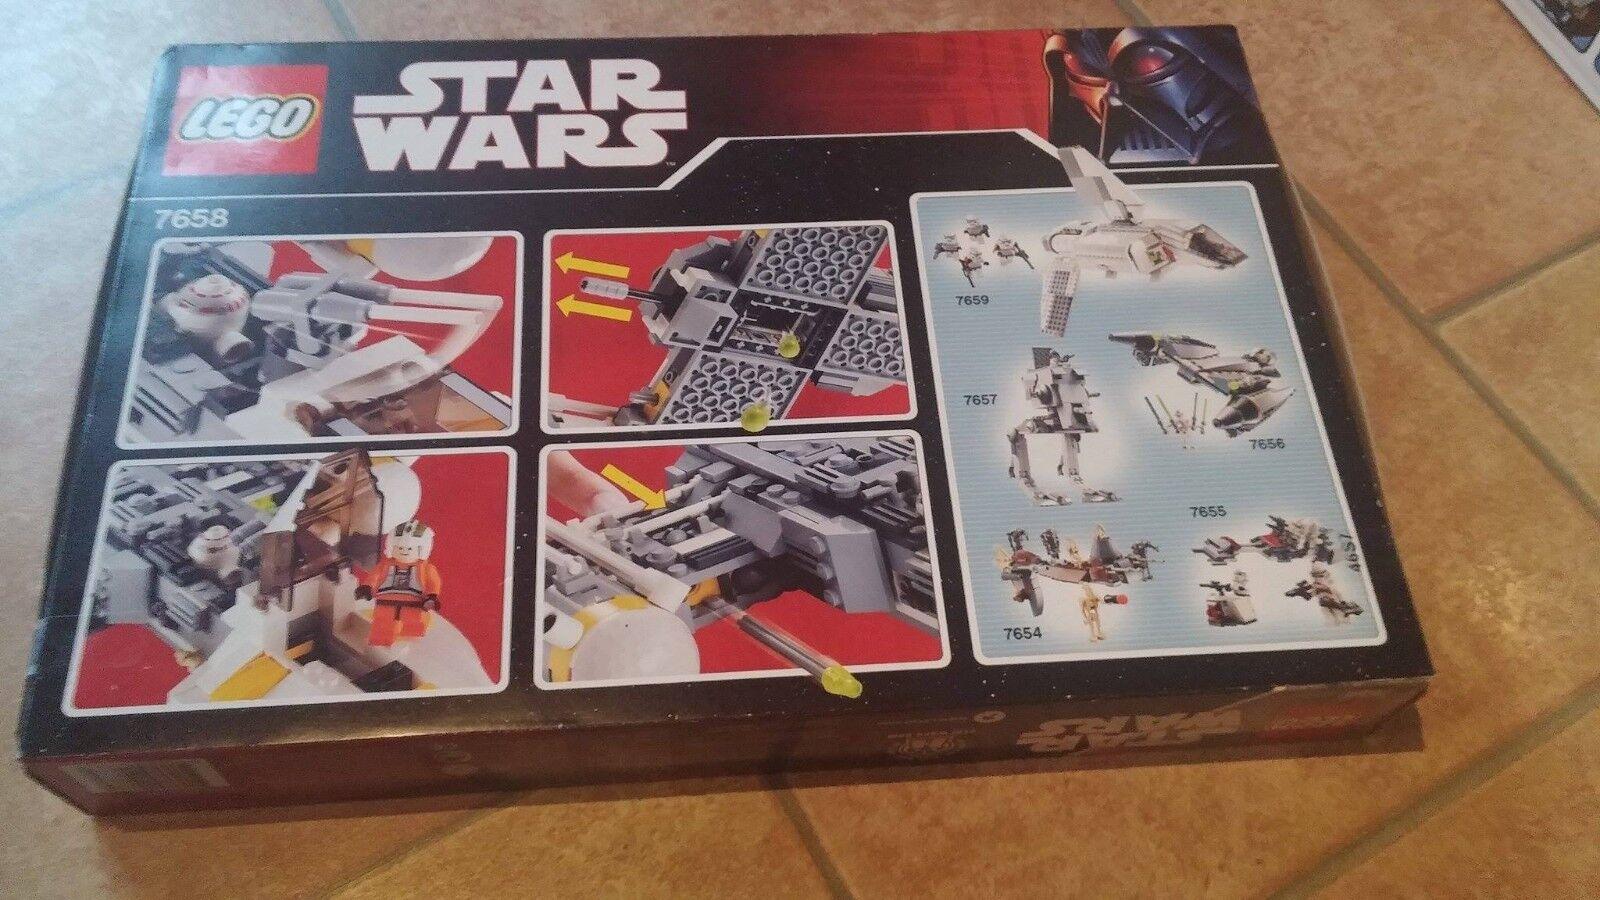 LEGO estrella guerras Y-Wing combatiente (7658)  NUOVO E OVP  prezzo basso